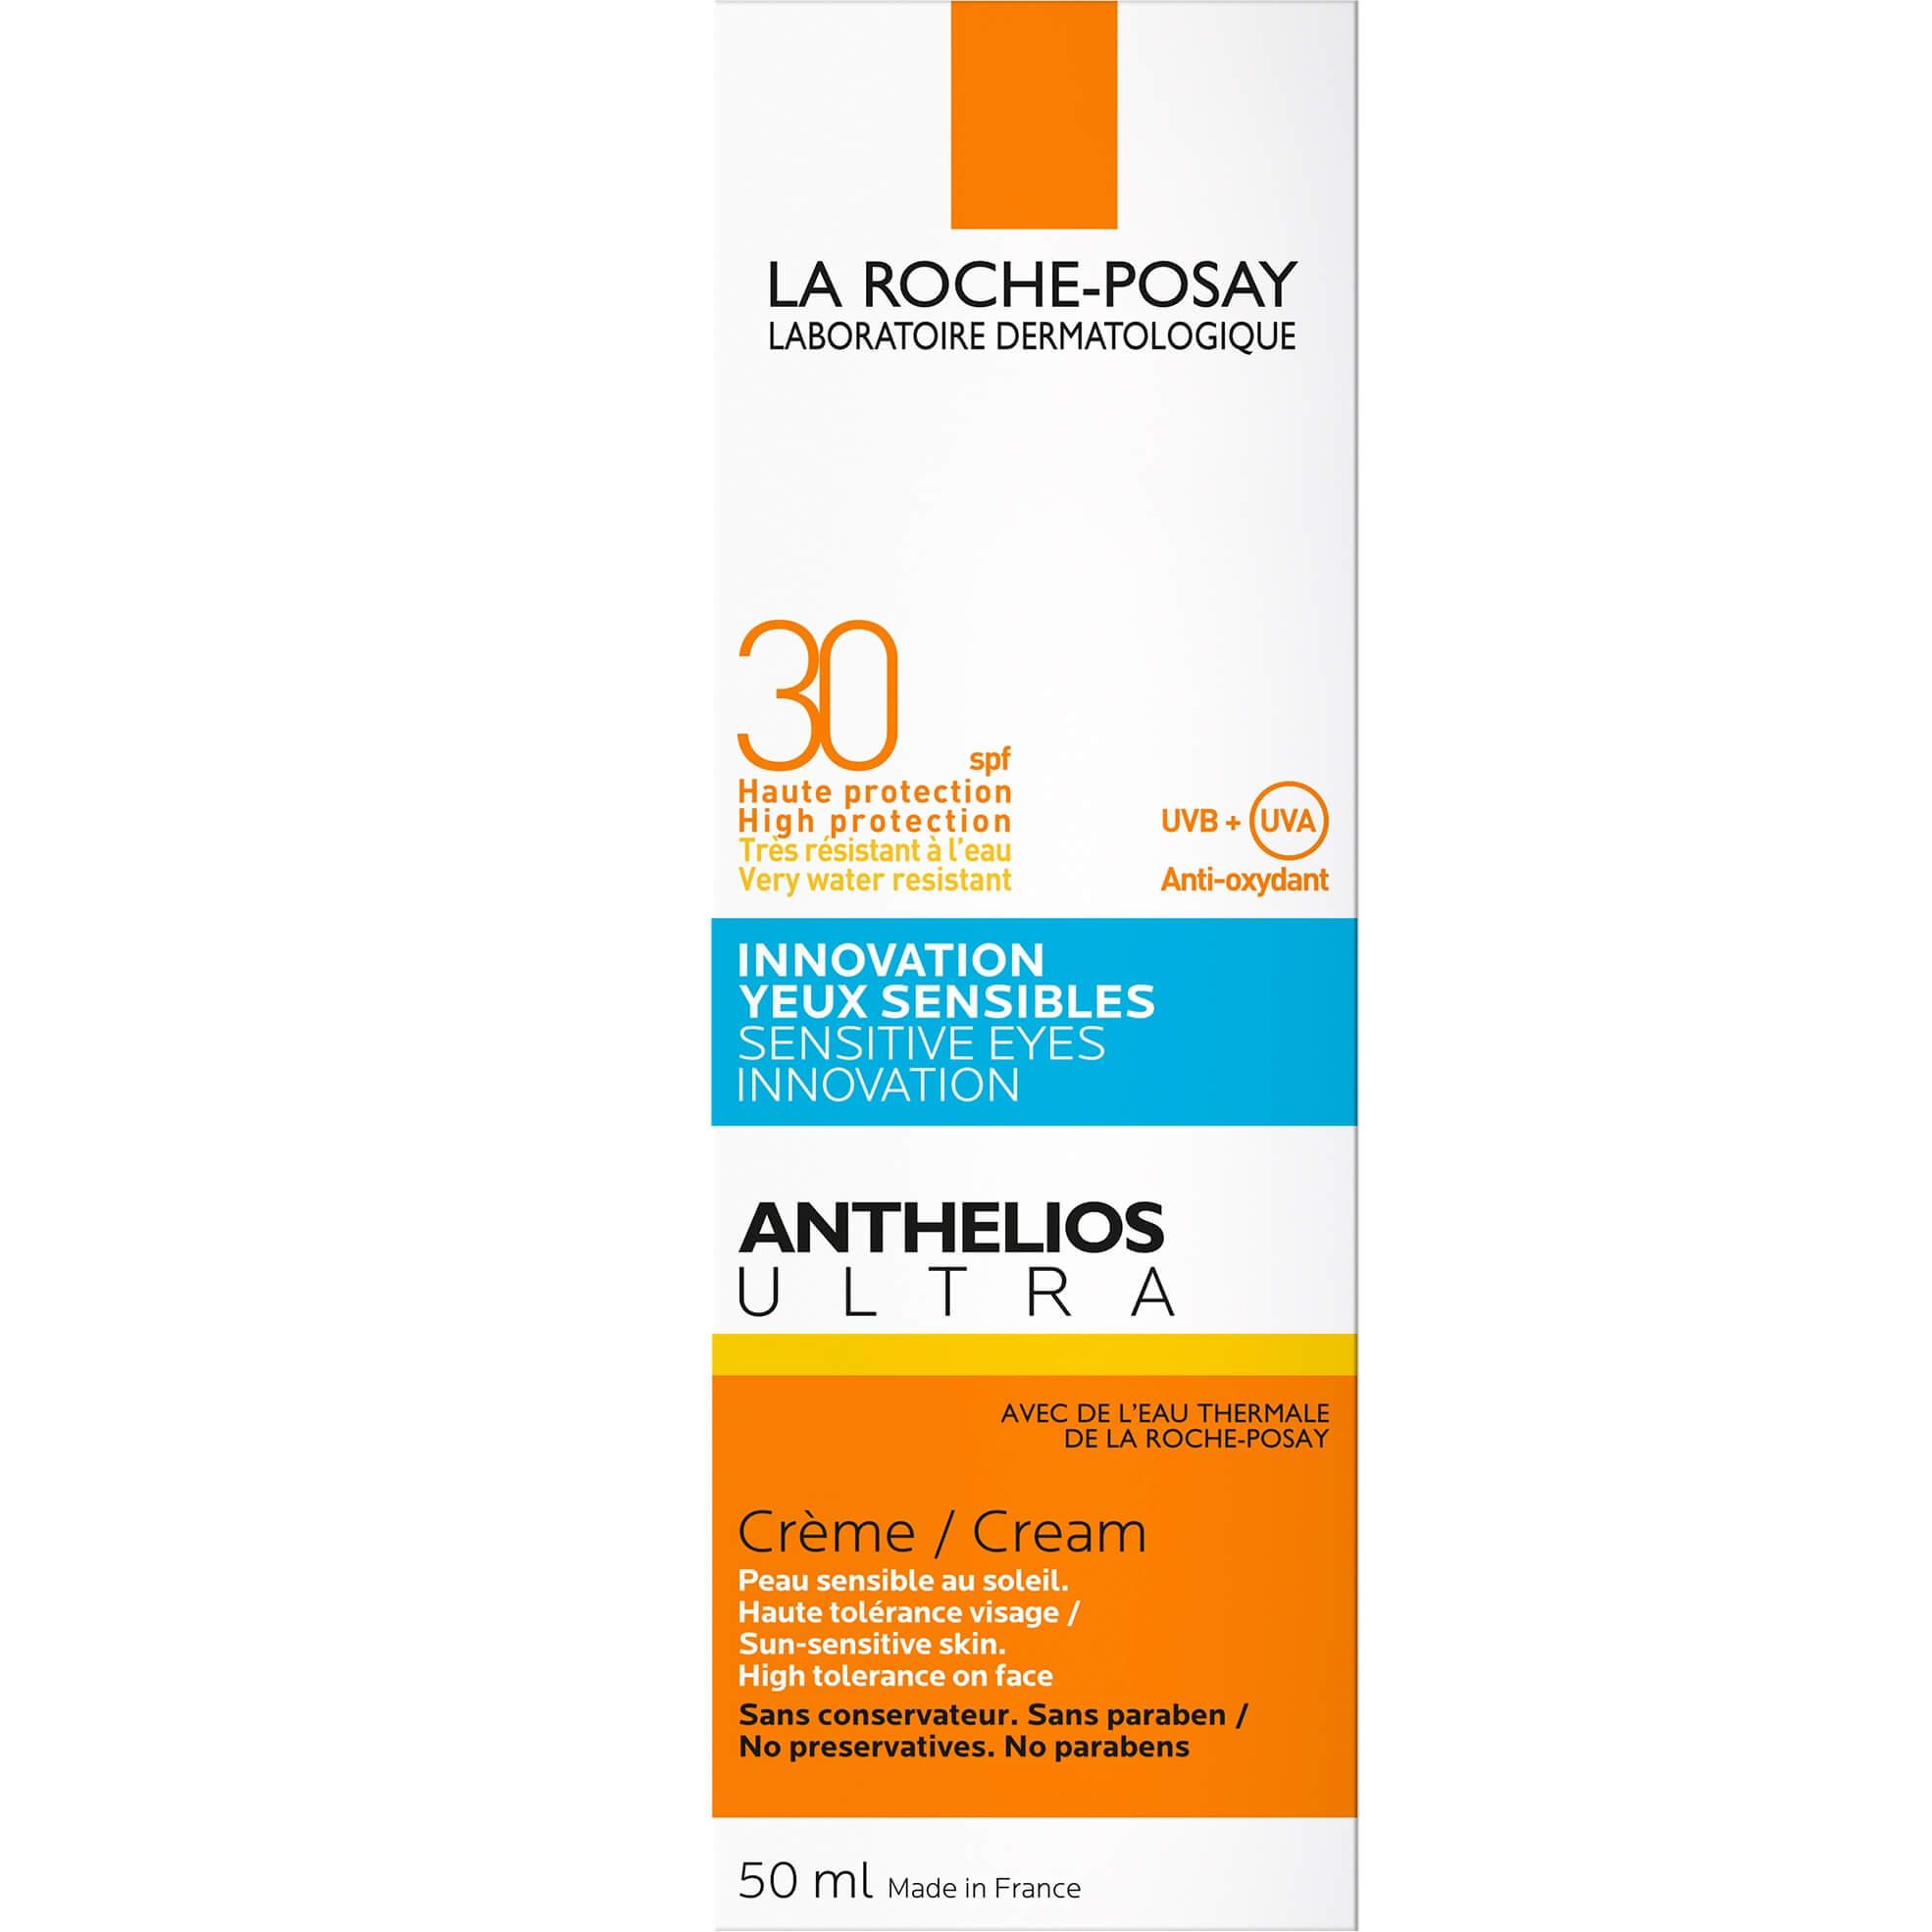 La Roche-Posay Anthelios Ultra Sensitive Eyes InnovationCream Spf30+ Αντηλιακό Προσώπου Ενάντιαστο Τσούξιμοτων Ματιών50ml